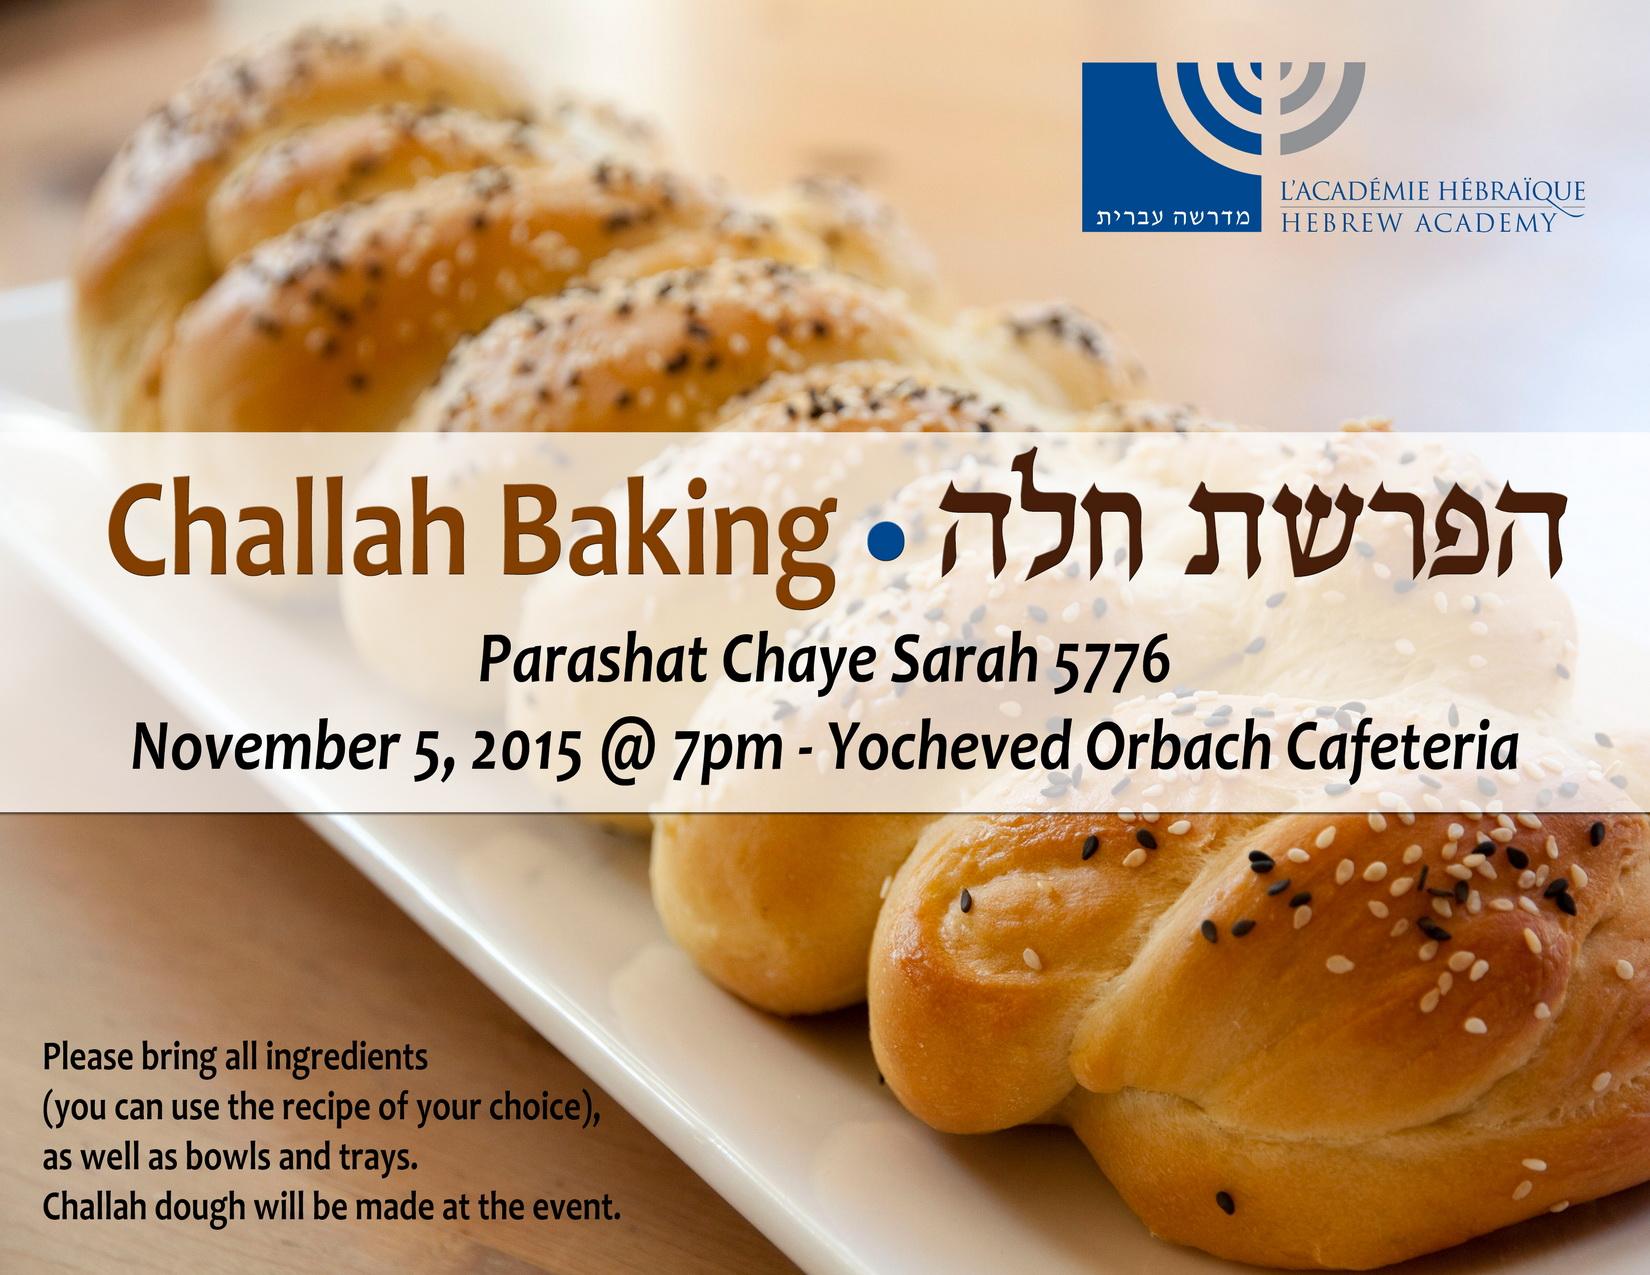 Challah Baking Event